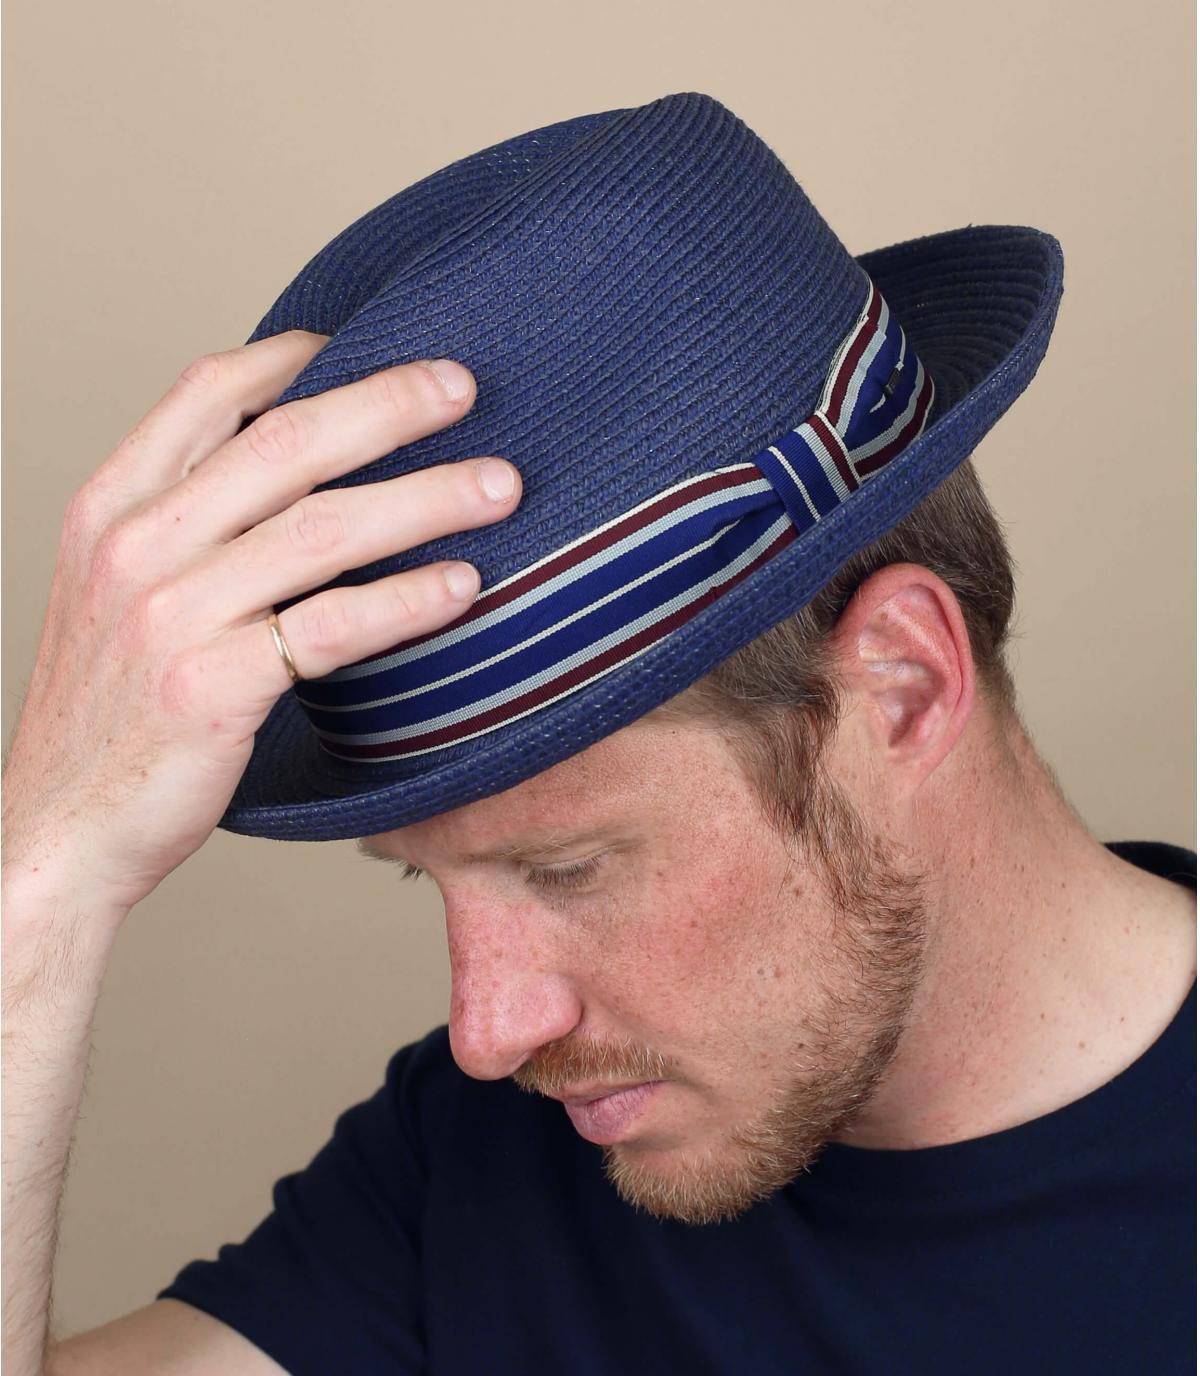 bailey marineblauwe strooien hoed